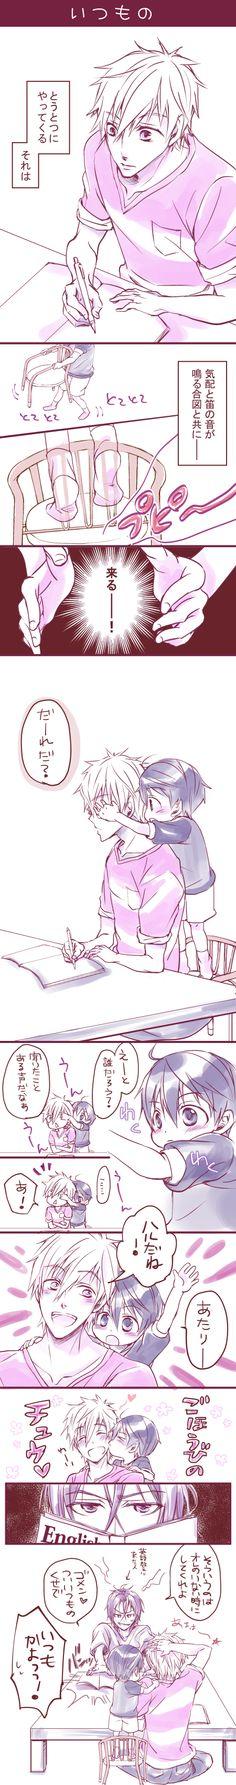 Studying ...  Drawn by pont_o ... Free! - Iwatobi Swim Club, haruka nanase, haru nanase, haru, free!, iwatobi, makoto tachibana, makoto, tachibana, nanase, rin, rin matsuoka, matsuoka